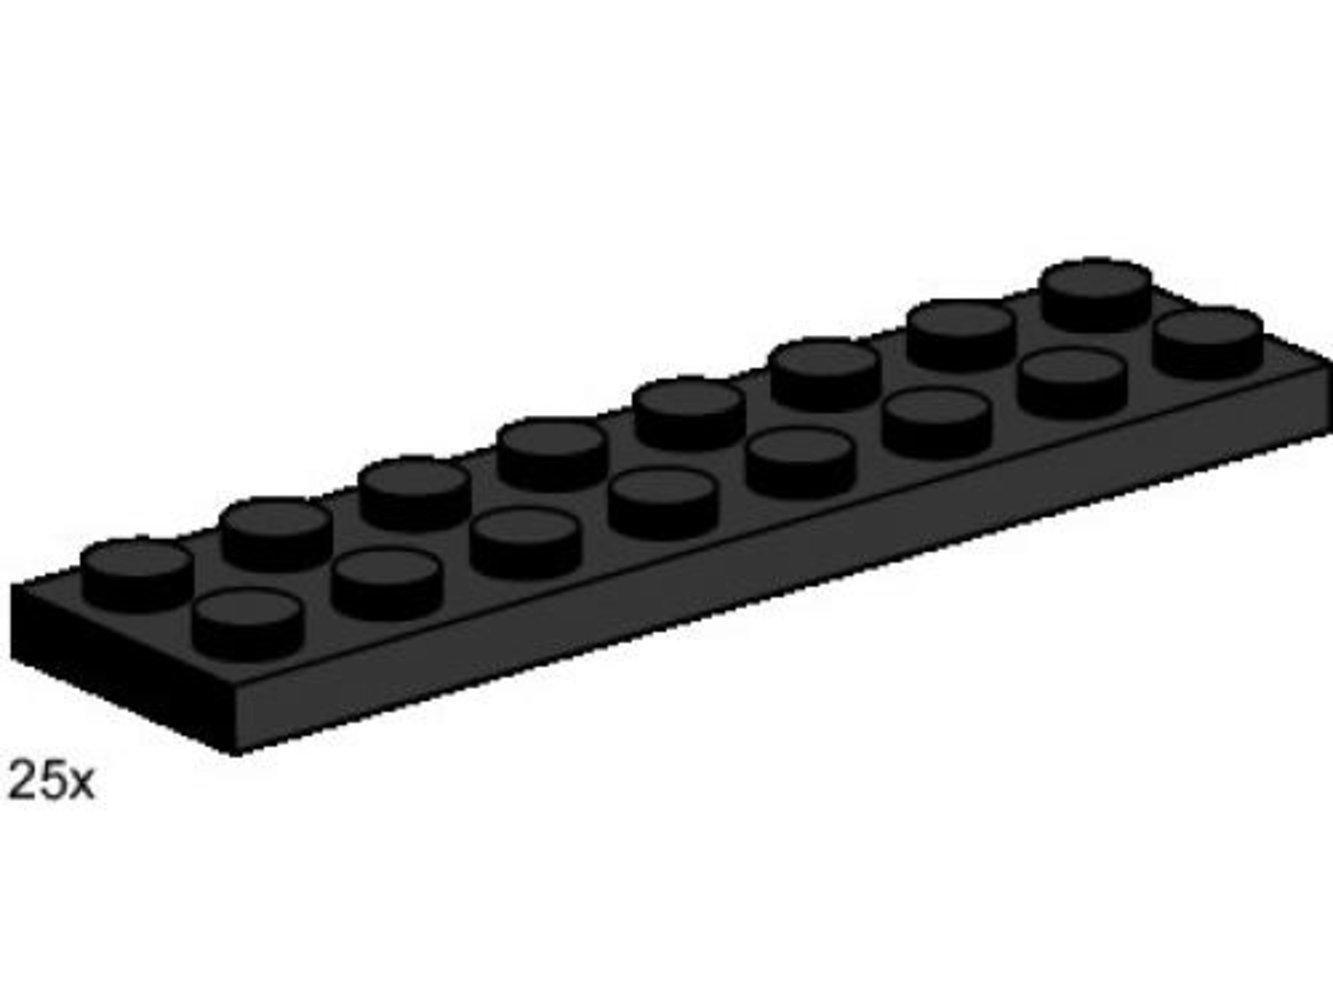 2 x 8 Black Plates